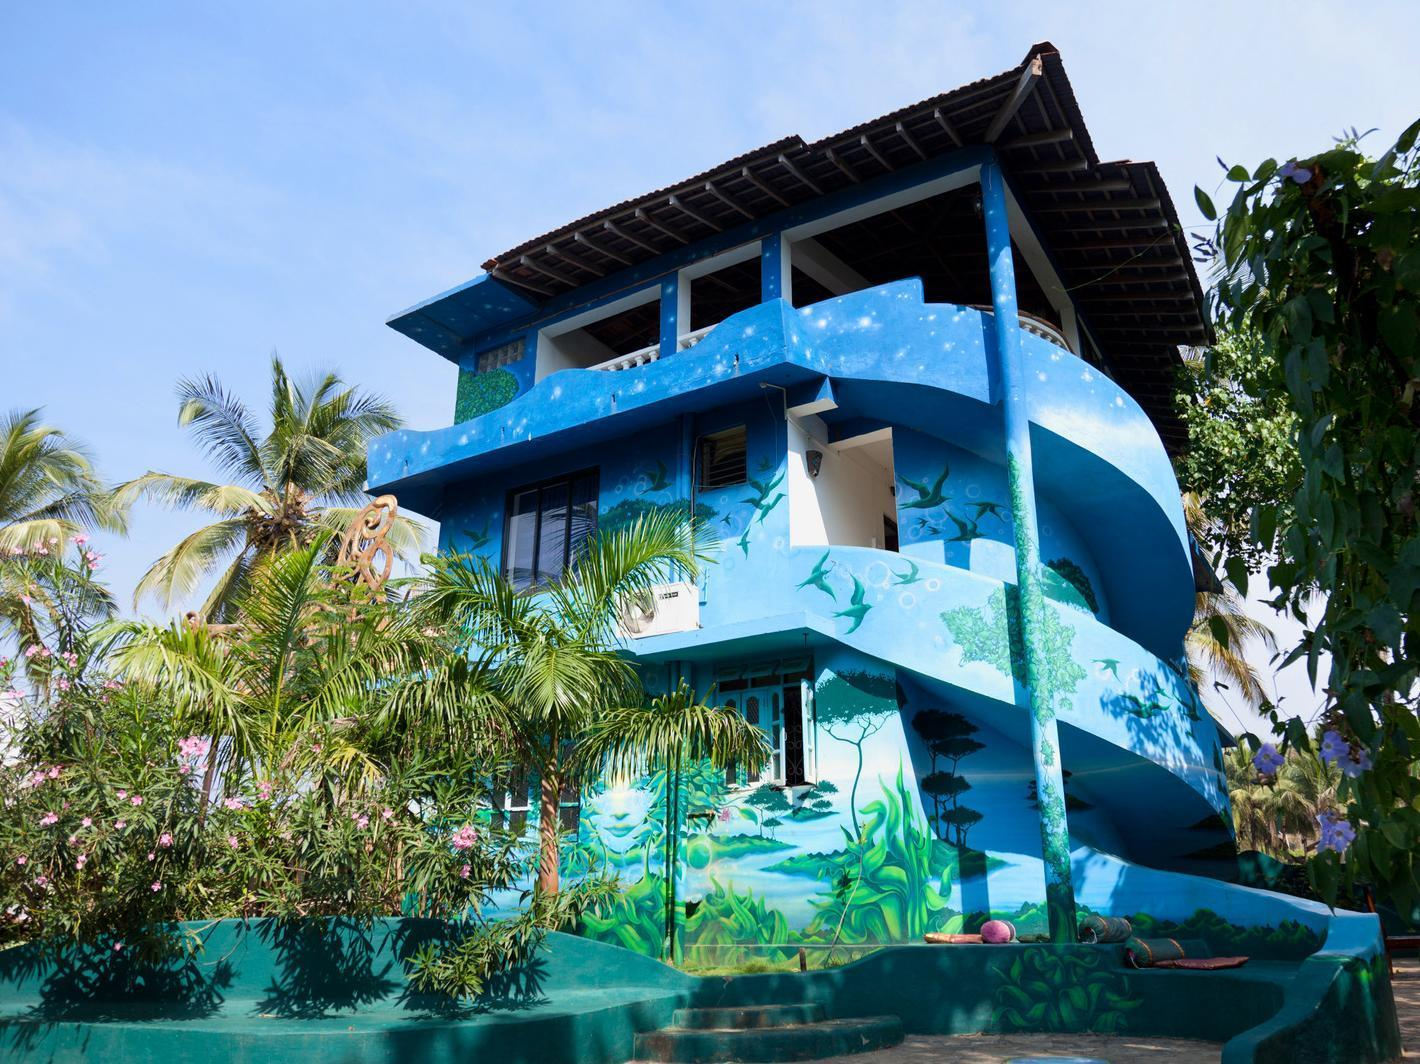 The Mandala Resort